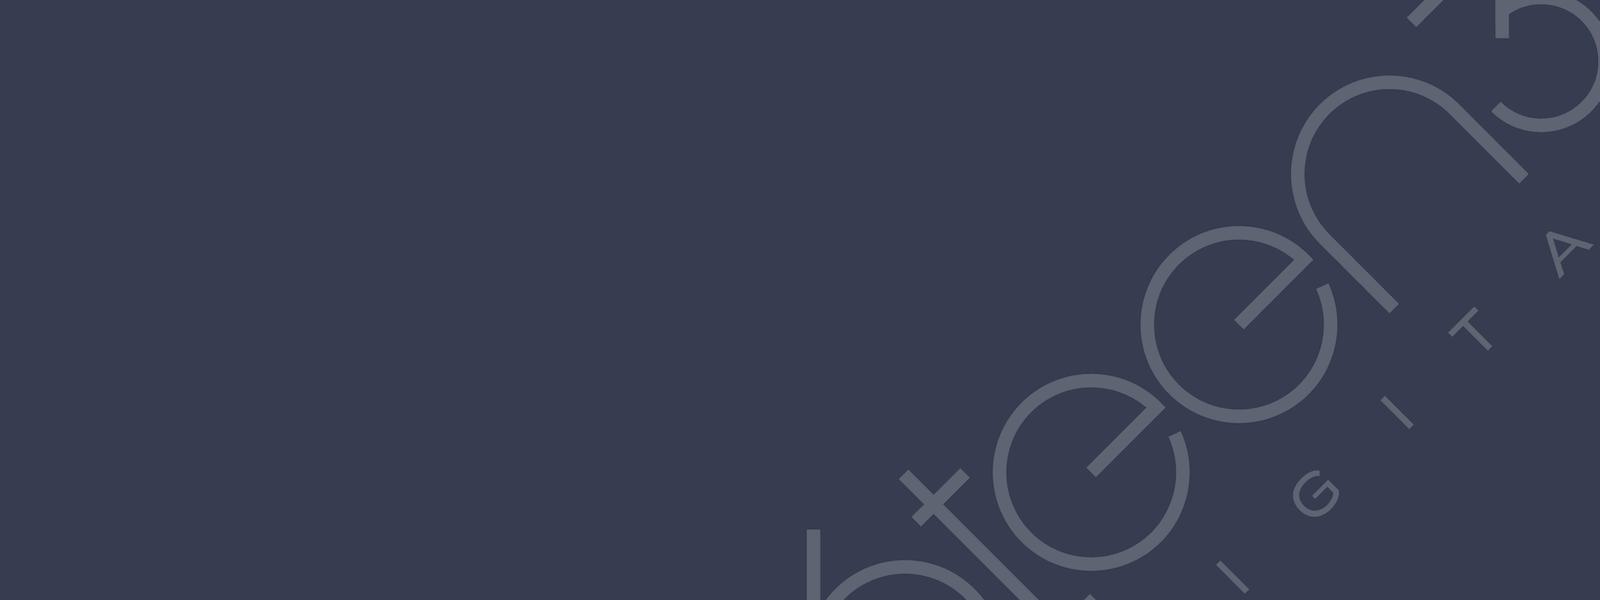 Growth Engine Process - 6teen30 Digital